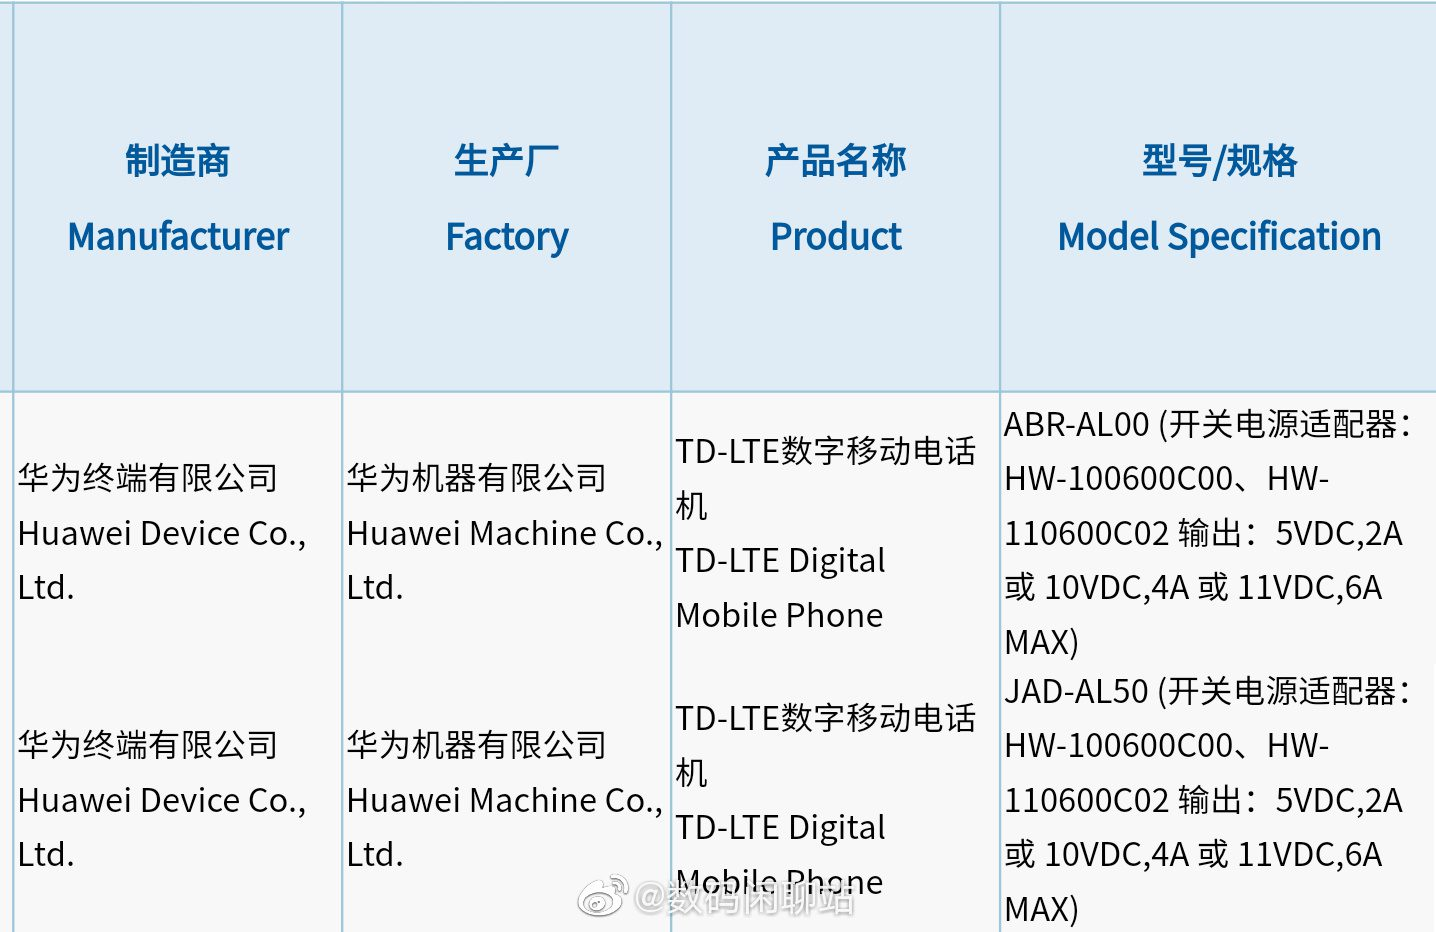 Просочились спецификации Huawei P50 Pro 4G